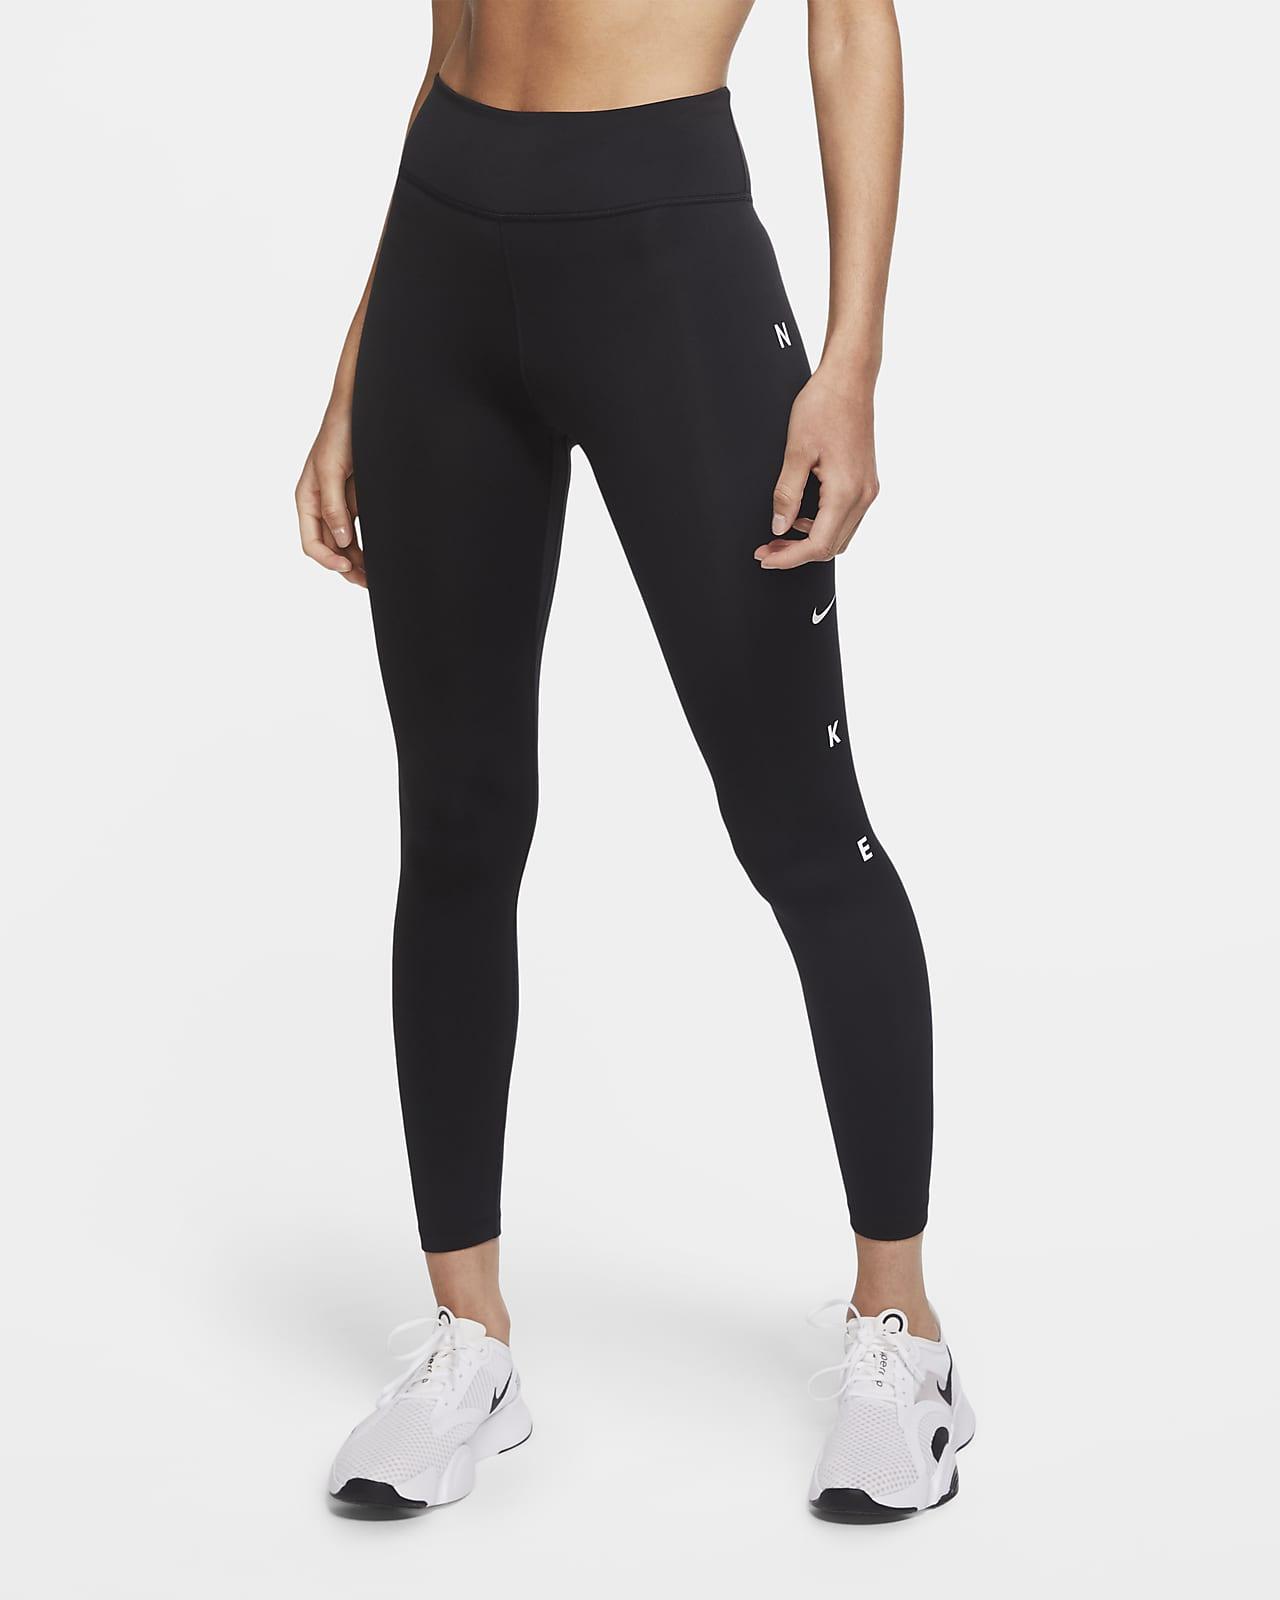 Nike One Women's Mid-Rise 7/8 Graphic Leggings